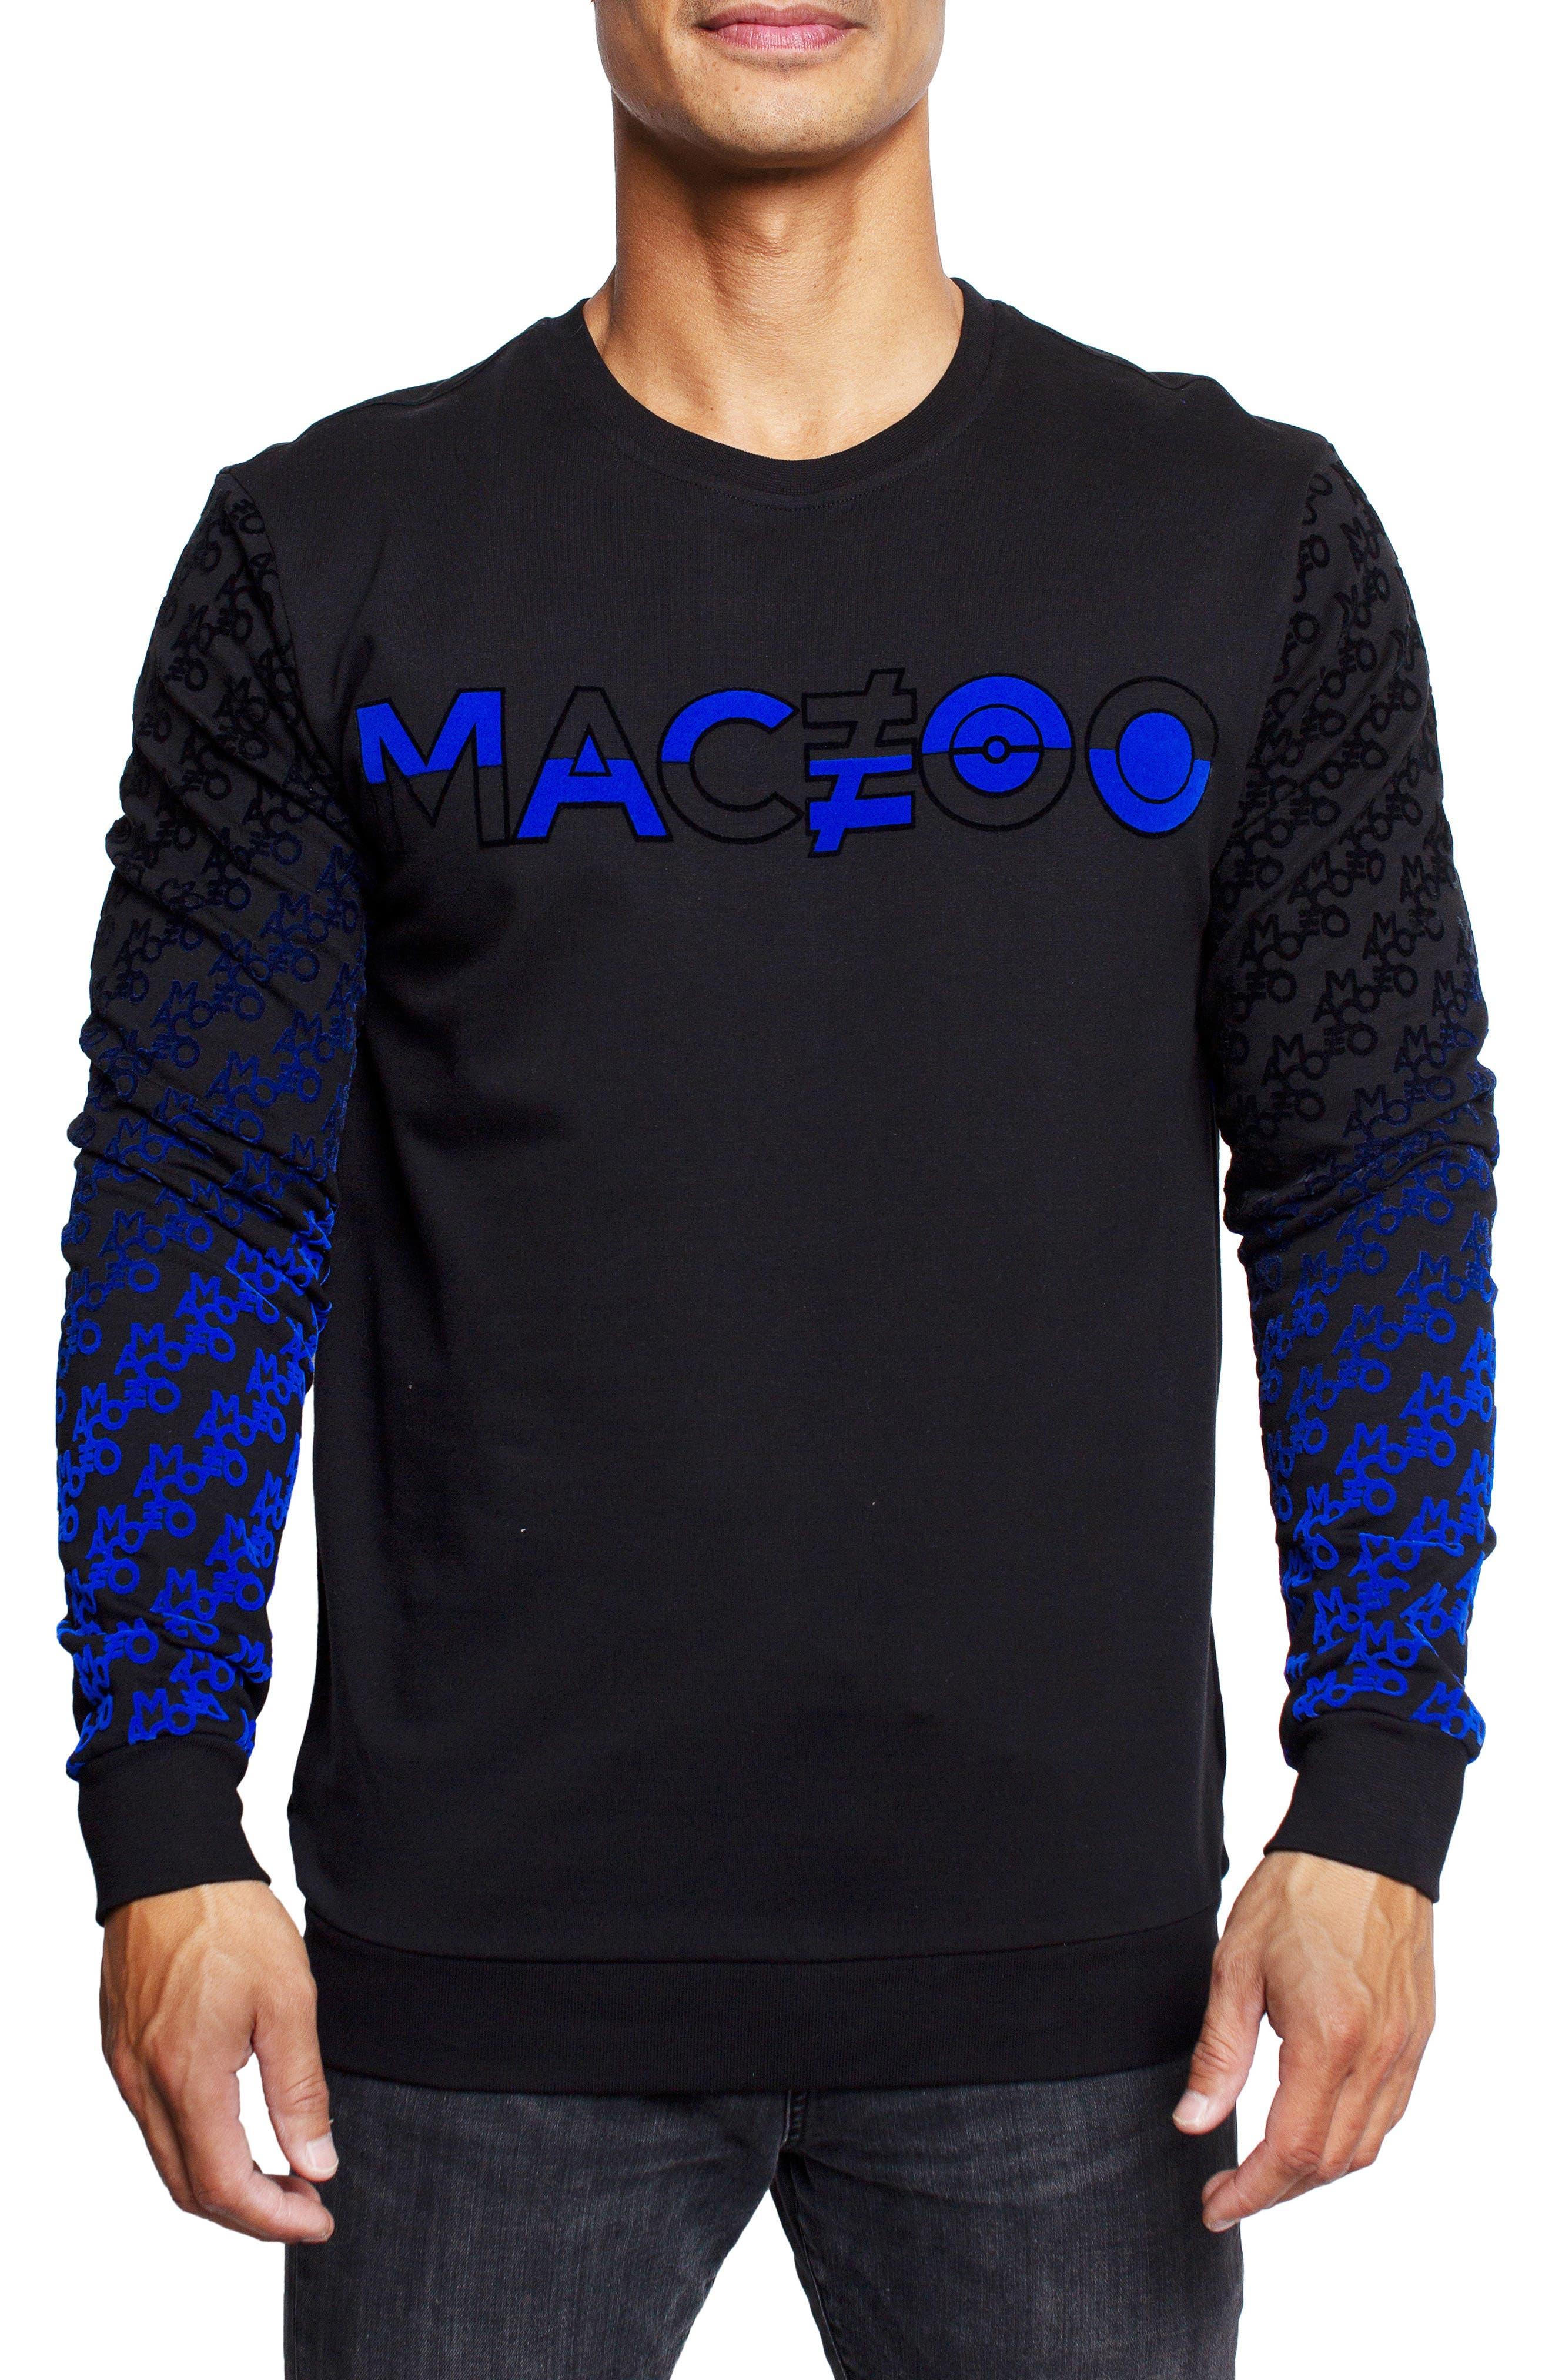 Monogram Stretch Cotton Crewneck Sweatshirt